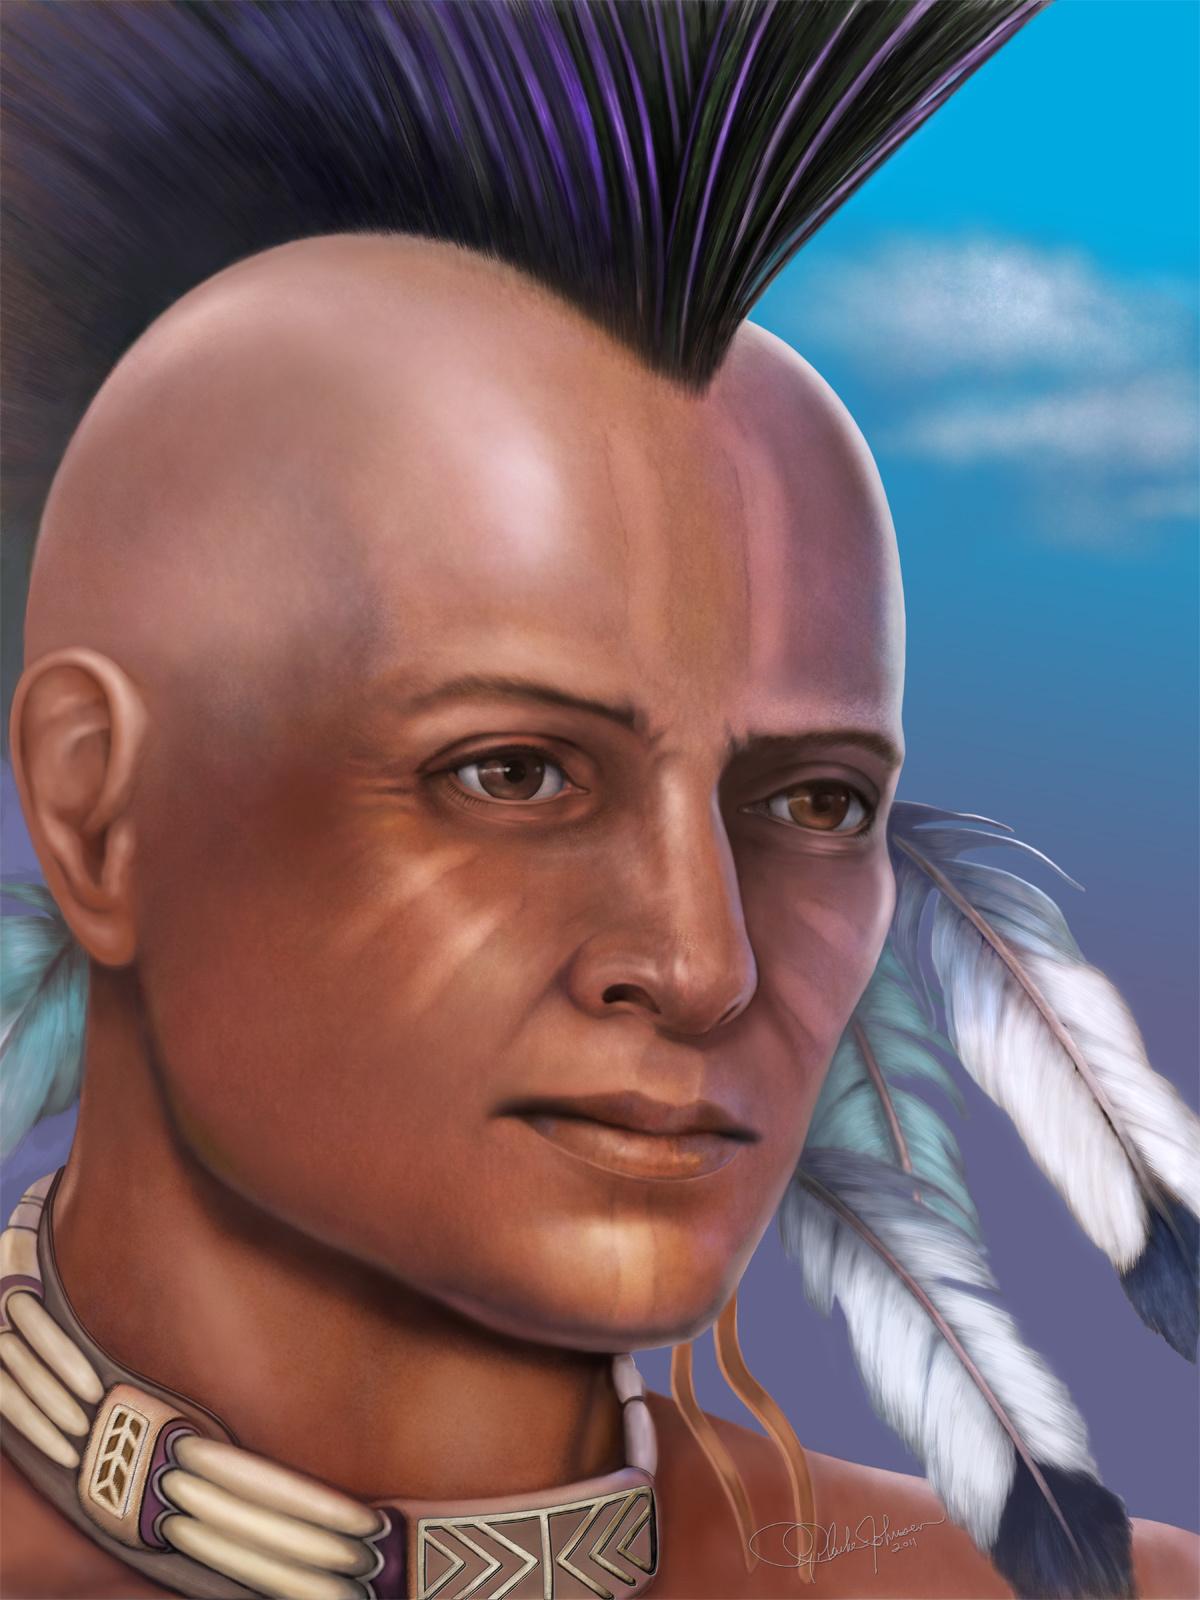 Vedanta keeper of wisdom 1 760823a7 sa08